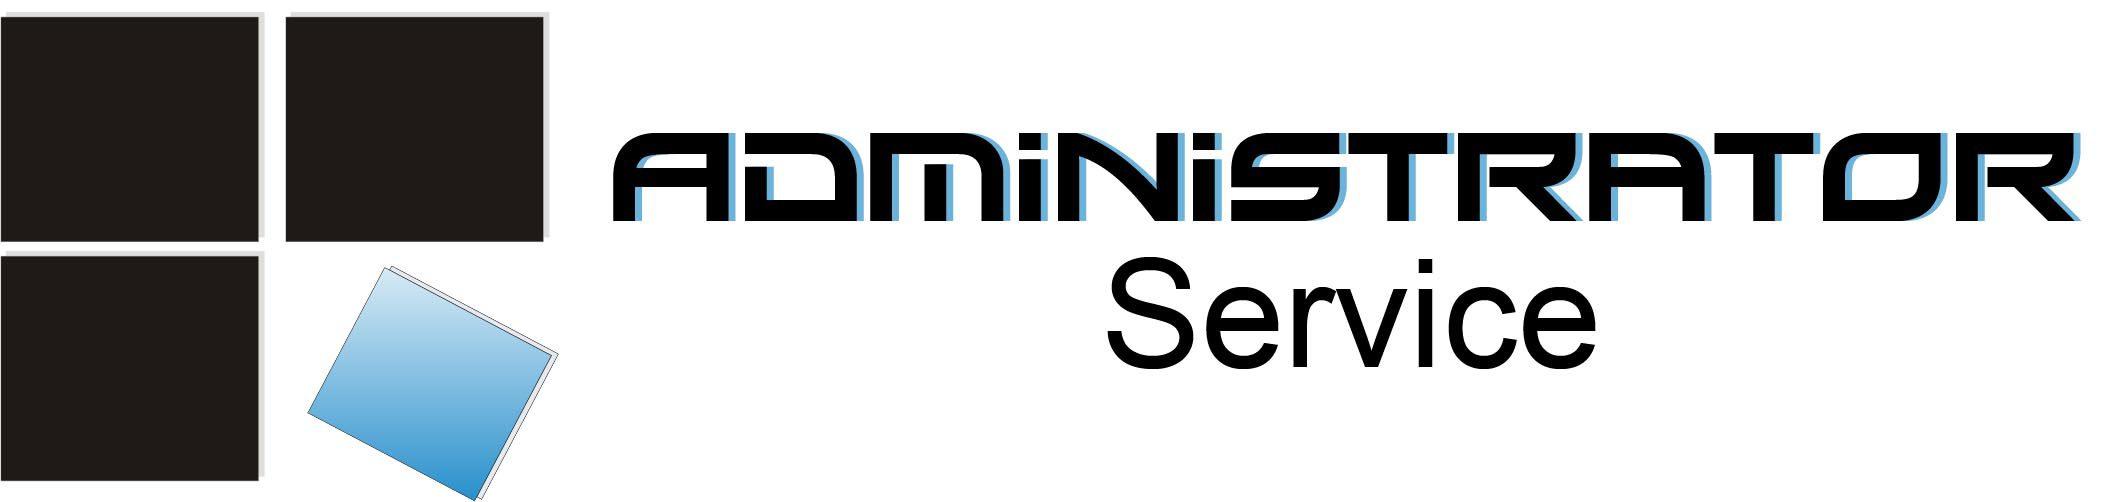 Administrator Service